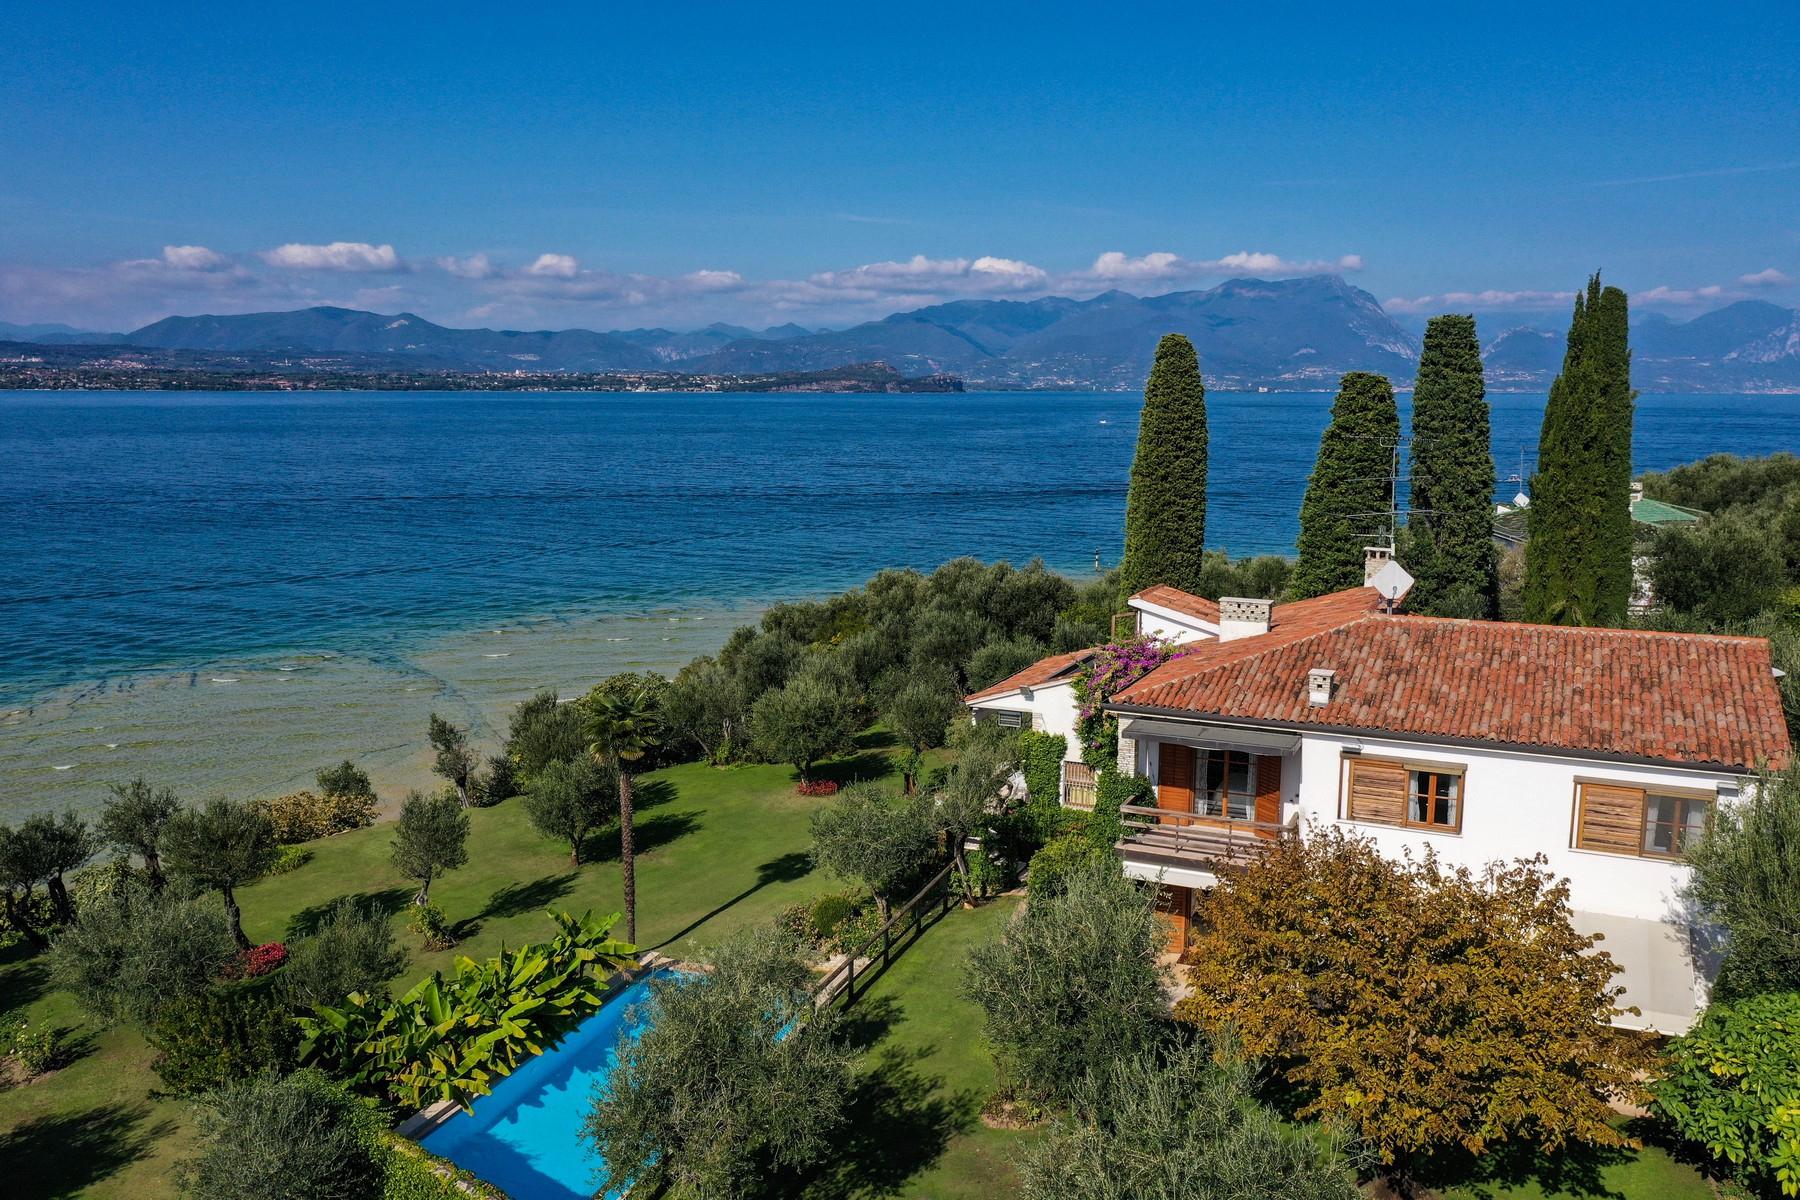 Villa in Vendita a Sirmione: 5 locali, 500 mq - Foto 3